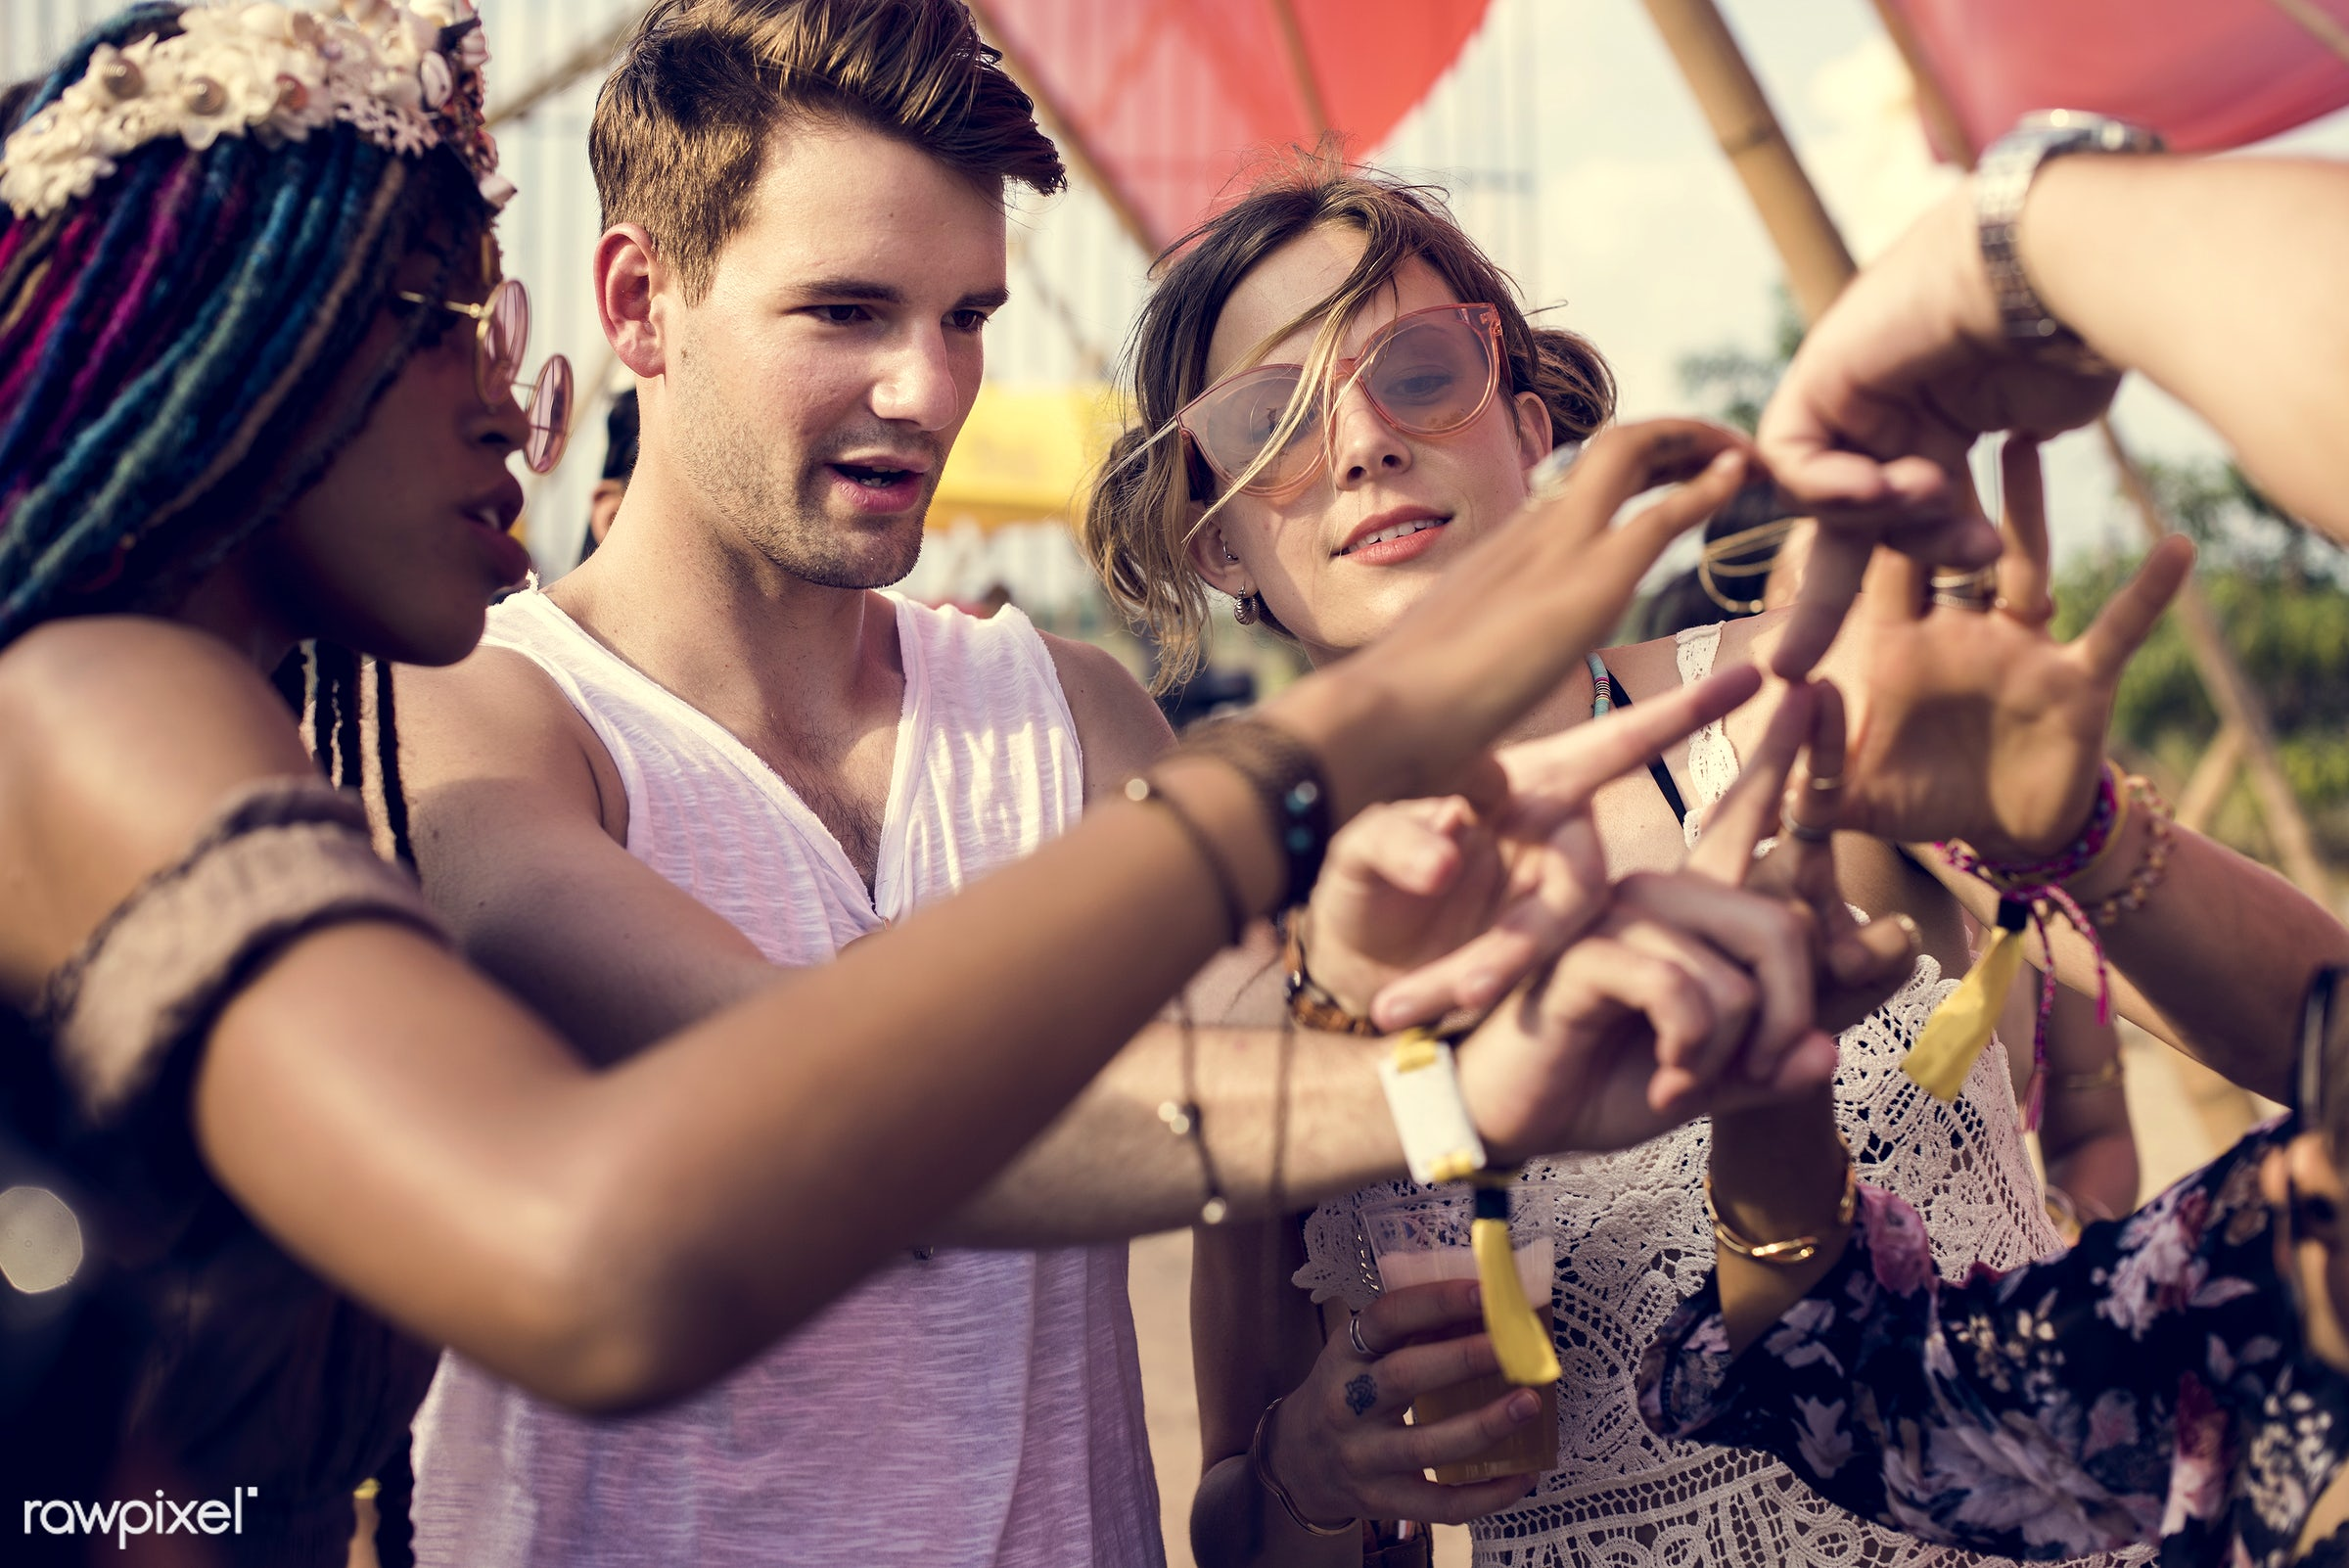 activity, adults, best friends, bonding, buddy, concert, crowd, diversity, enjoying, enjoyment, event, festival, festive,...